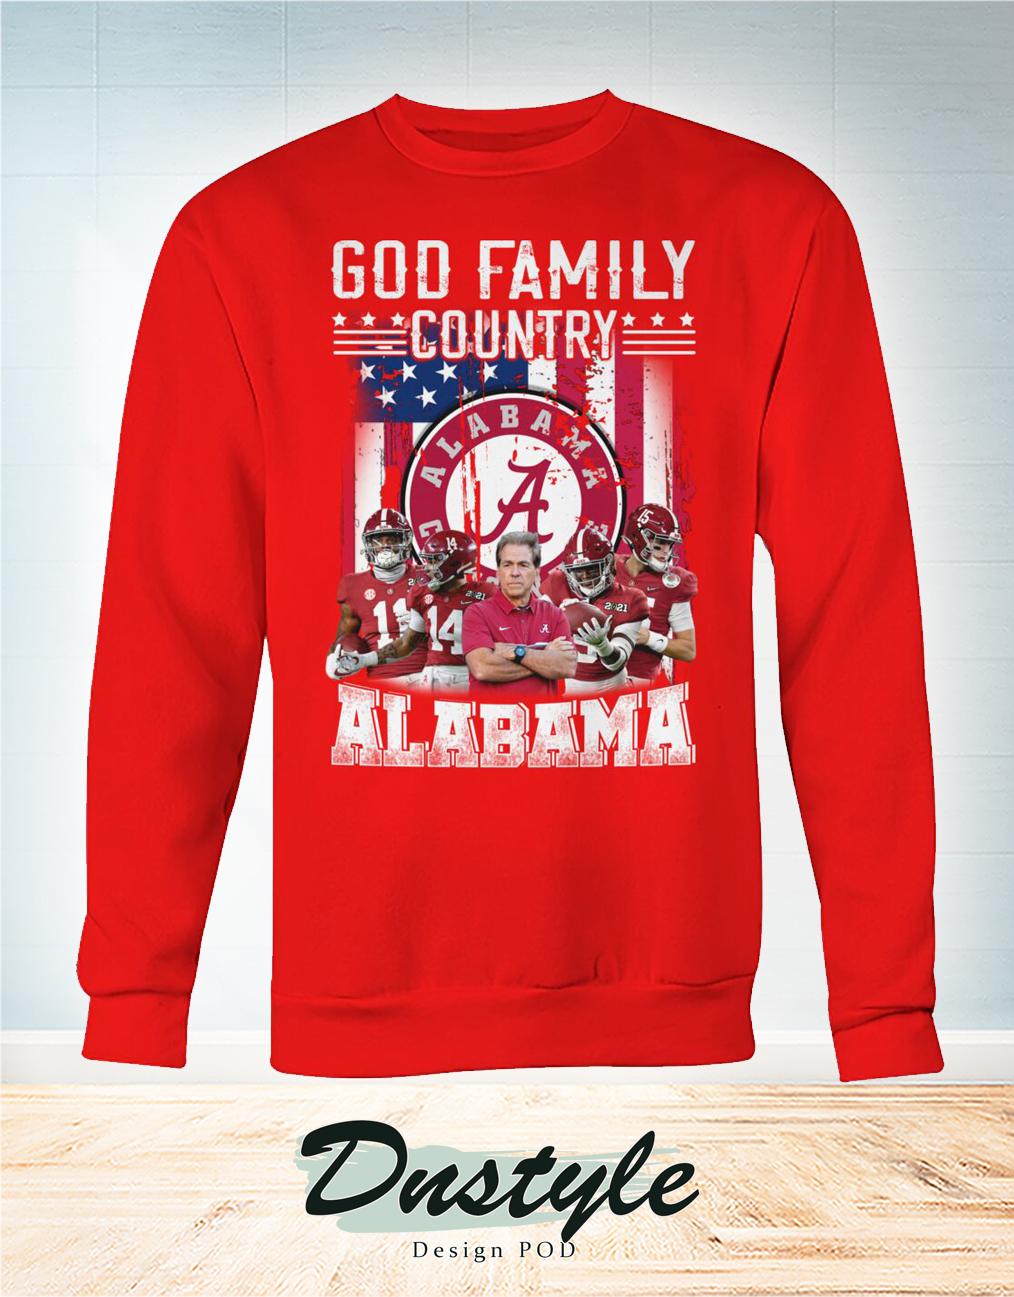 God family country Alabama sweatshirt